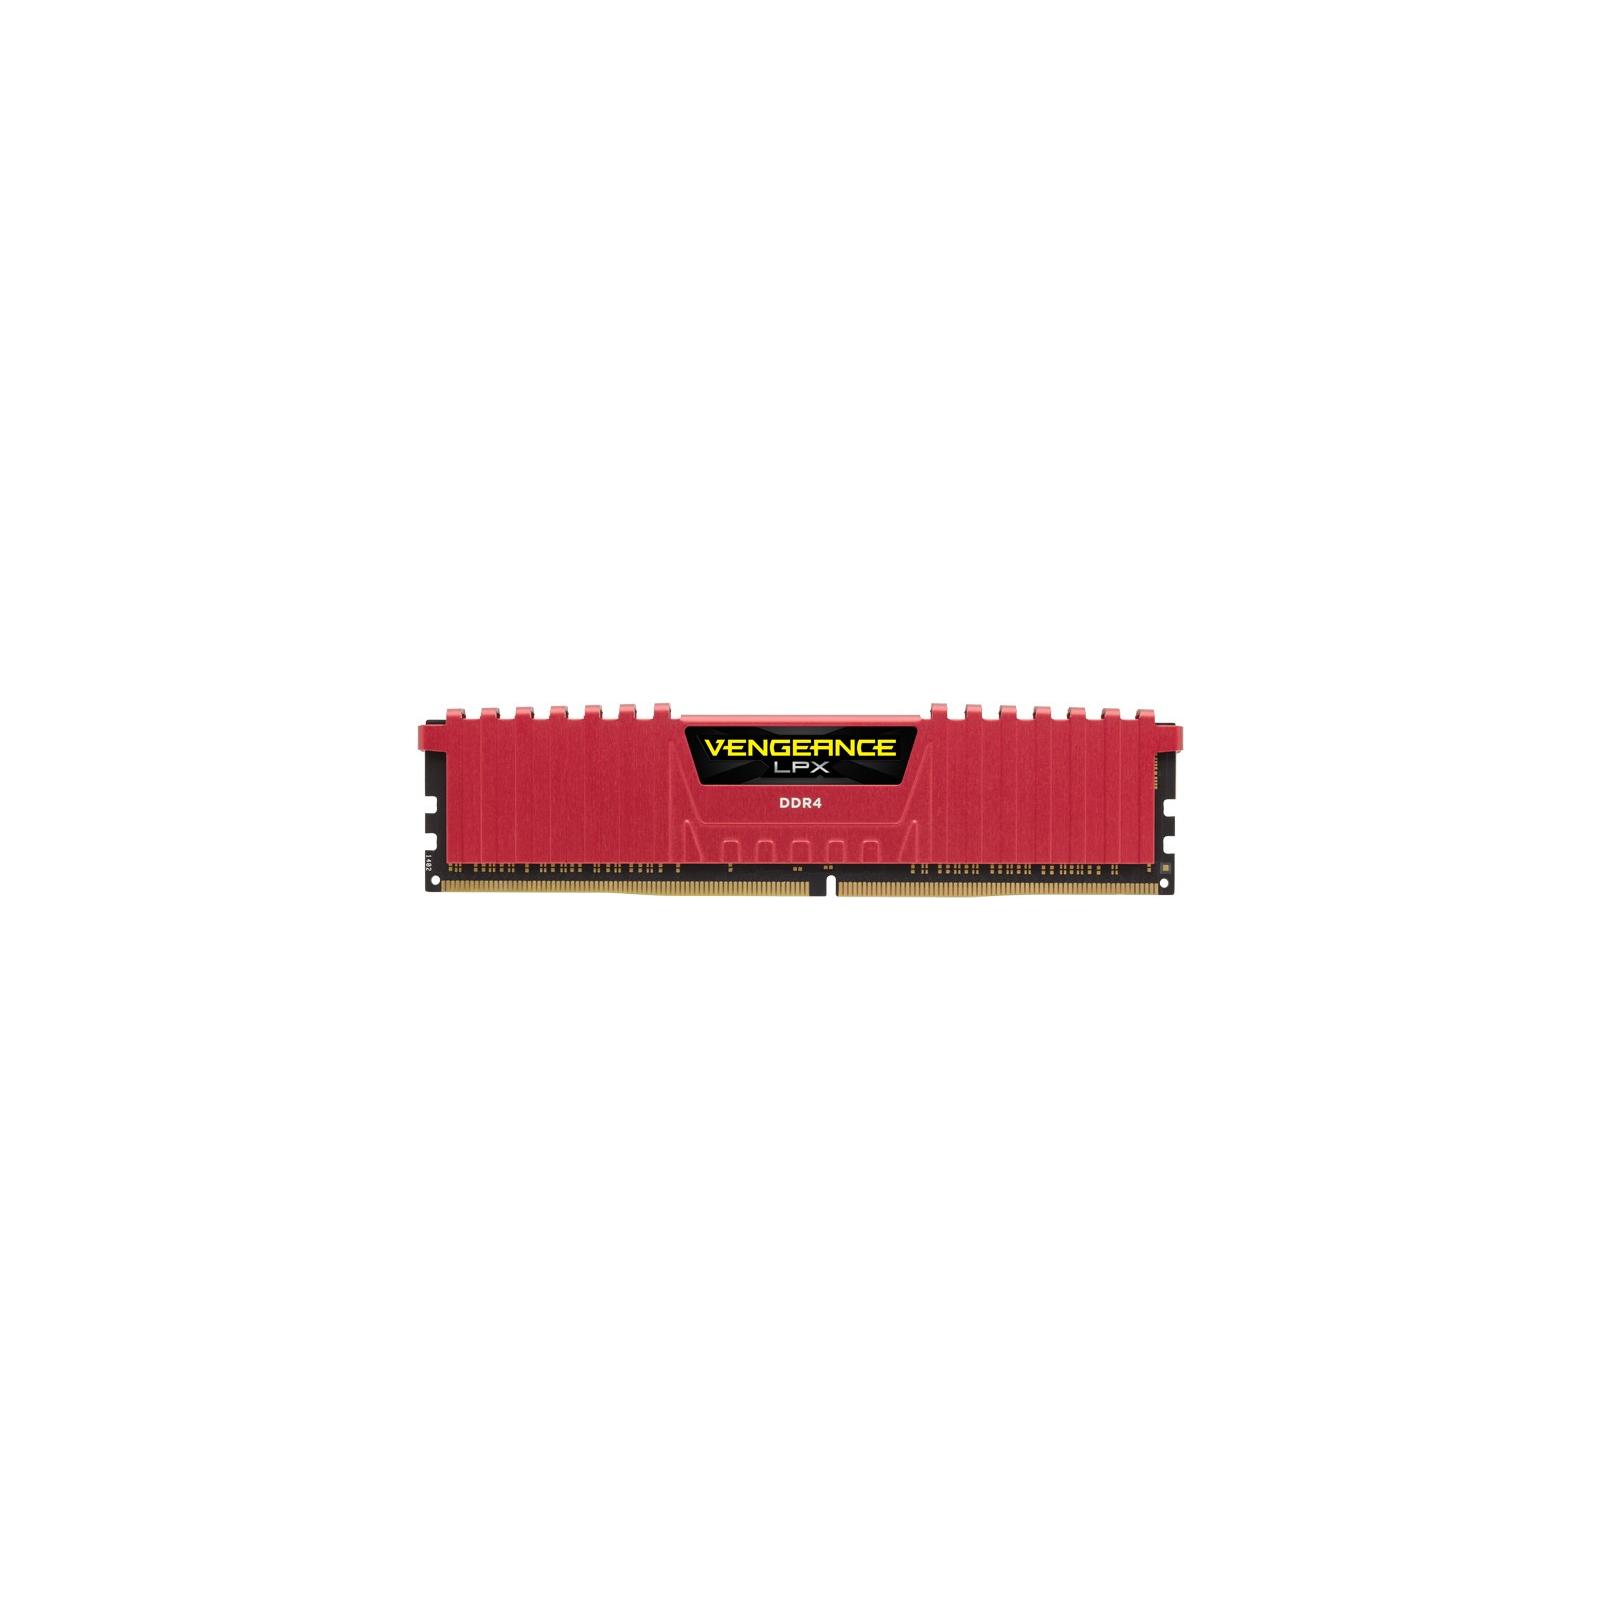 Модуль памяти для компьютера DDR4 8GB 2400 MHz Vengeance LPX Red CORSAIR (CMK8GX4M1A2400C14R)